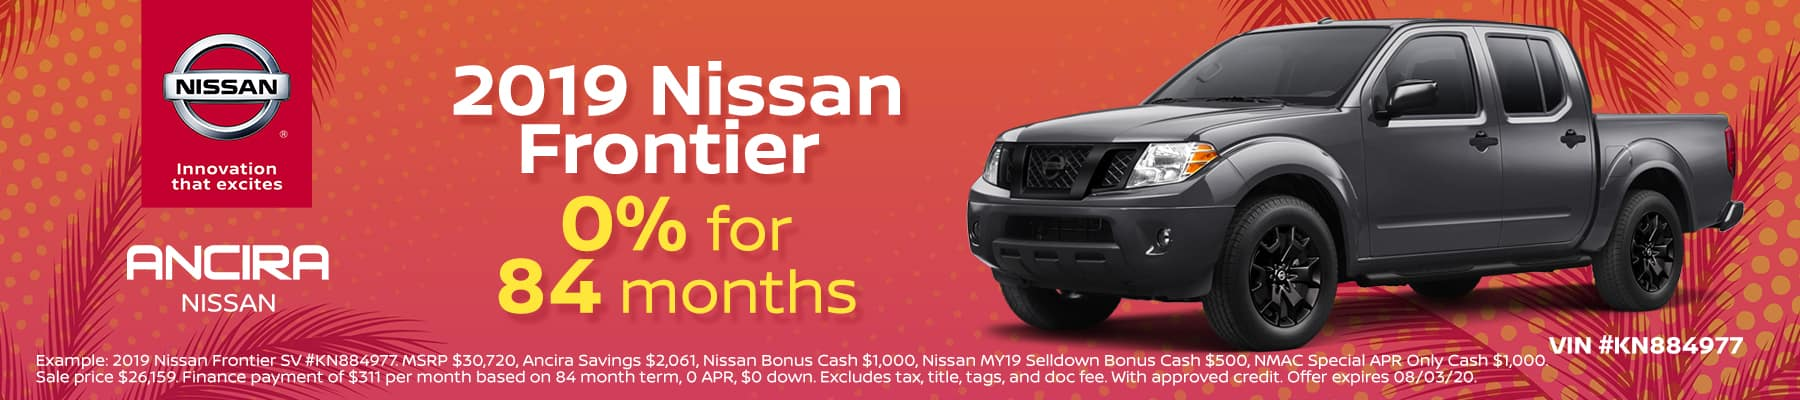 2019 Nissan Frontier - San Antonio, TX - Ancira Nissan